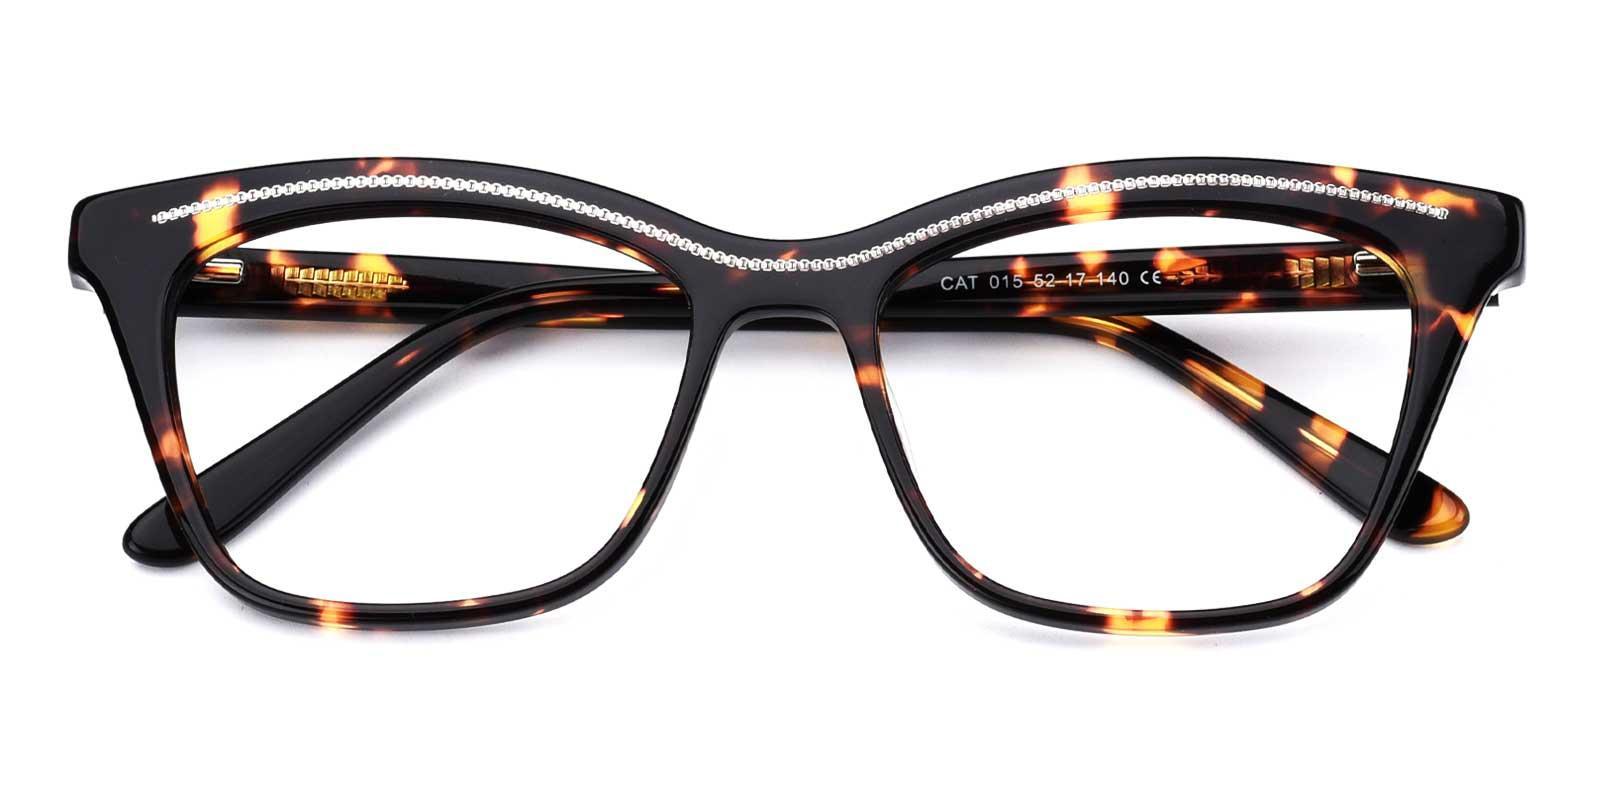 Tina-Tortoise-Square-Acetate-Eyeglasses-detail